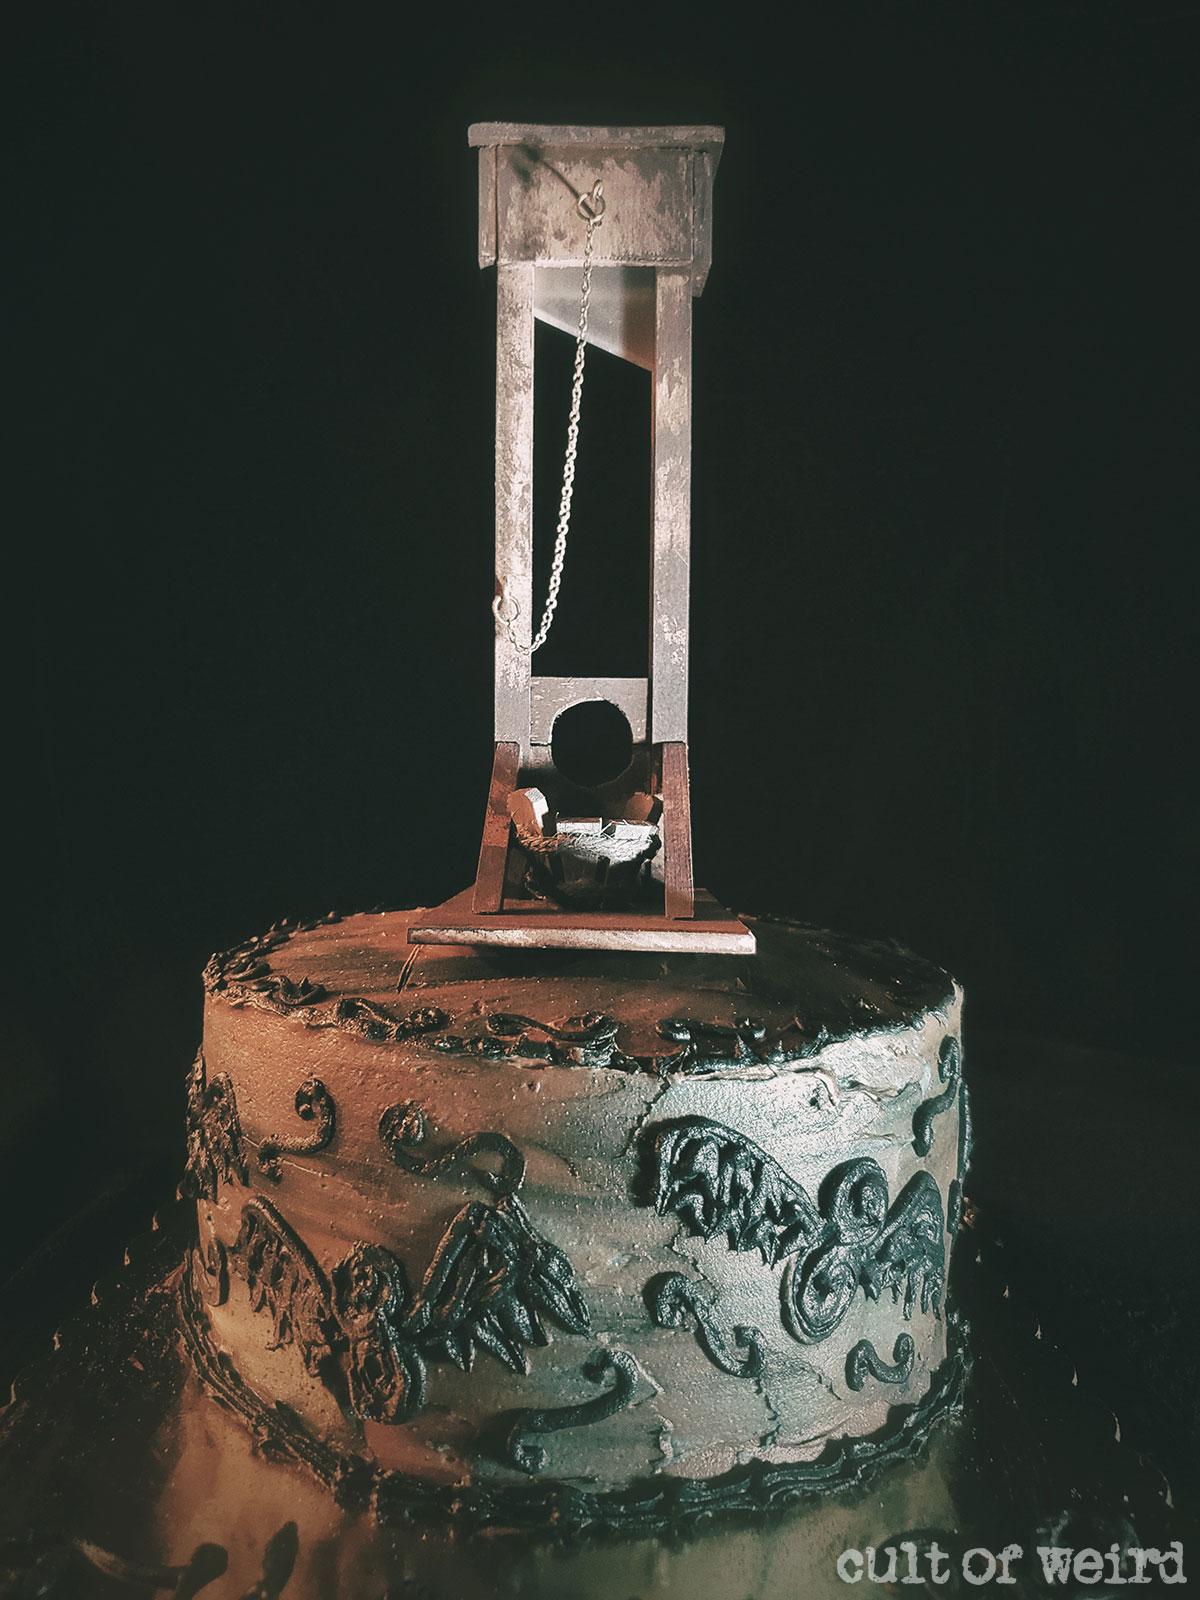 Addams Family guillotine cake